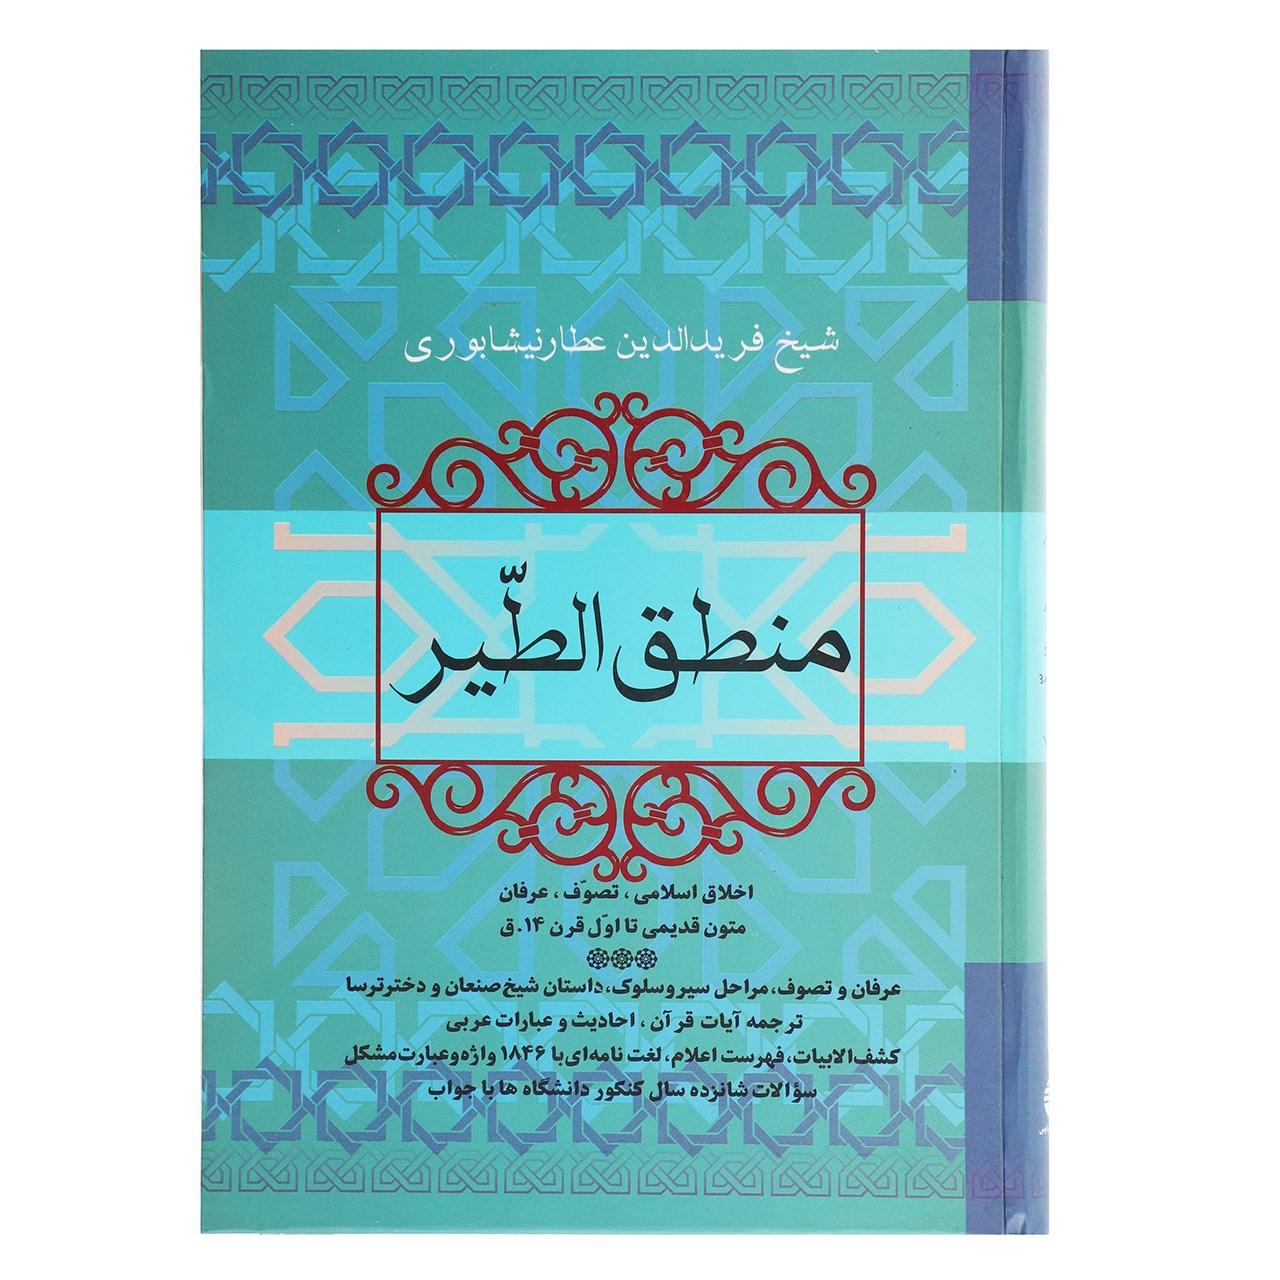 کتاب منطق الطیر اثر فریدالدین عطار نیشابوری